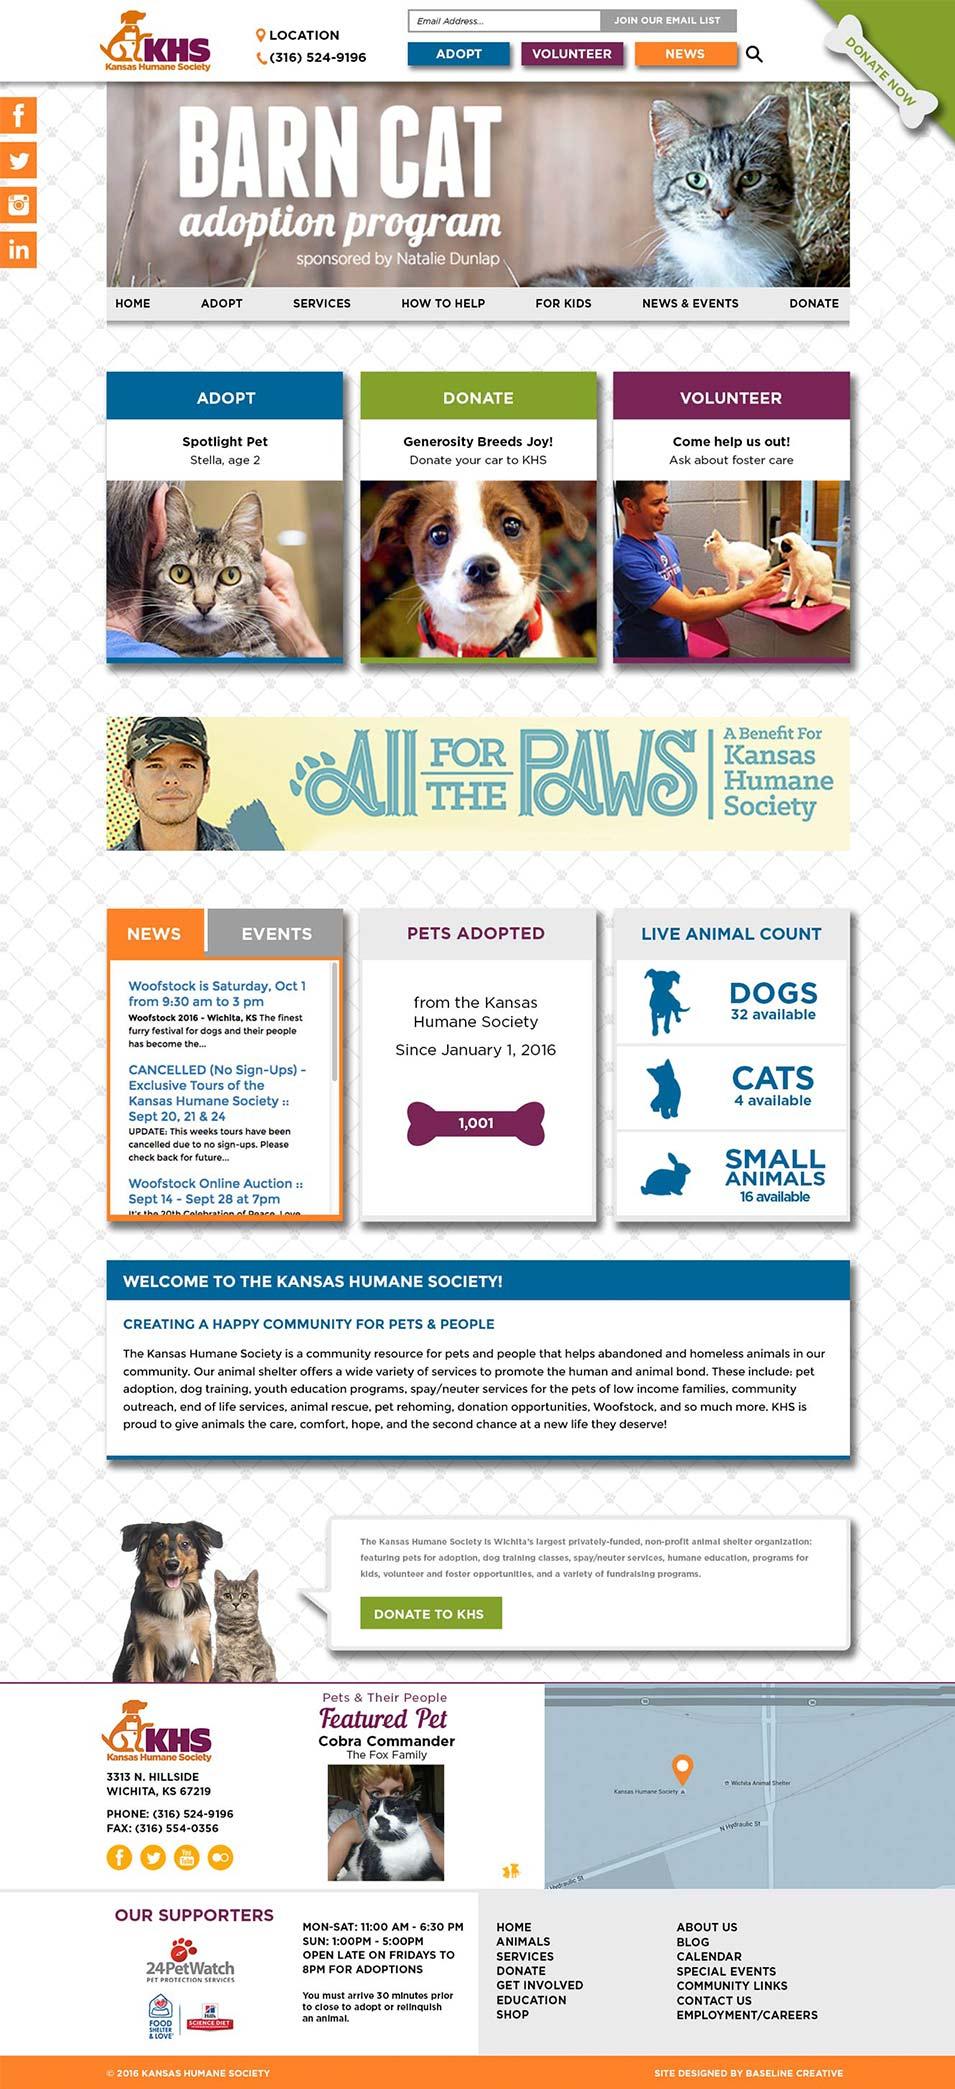 Kansas Humane Society website design